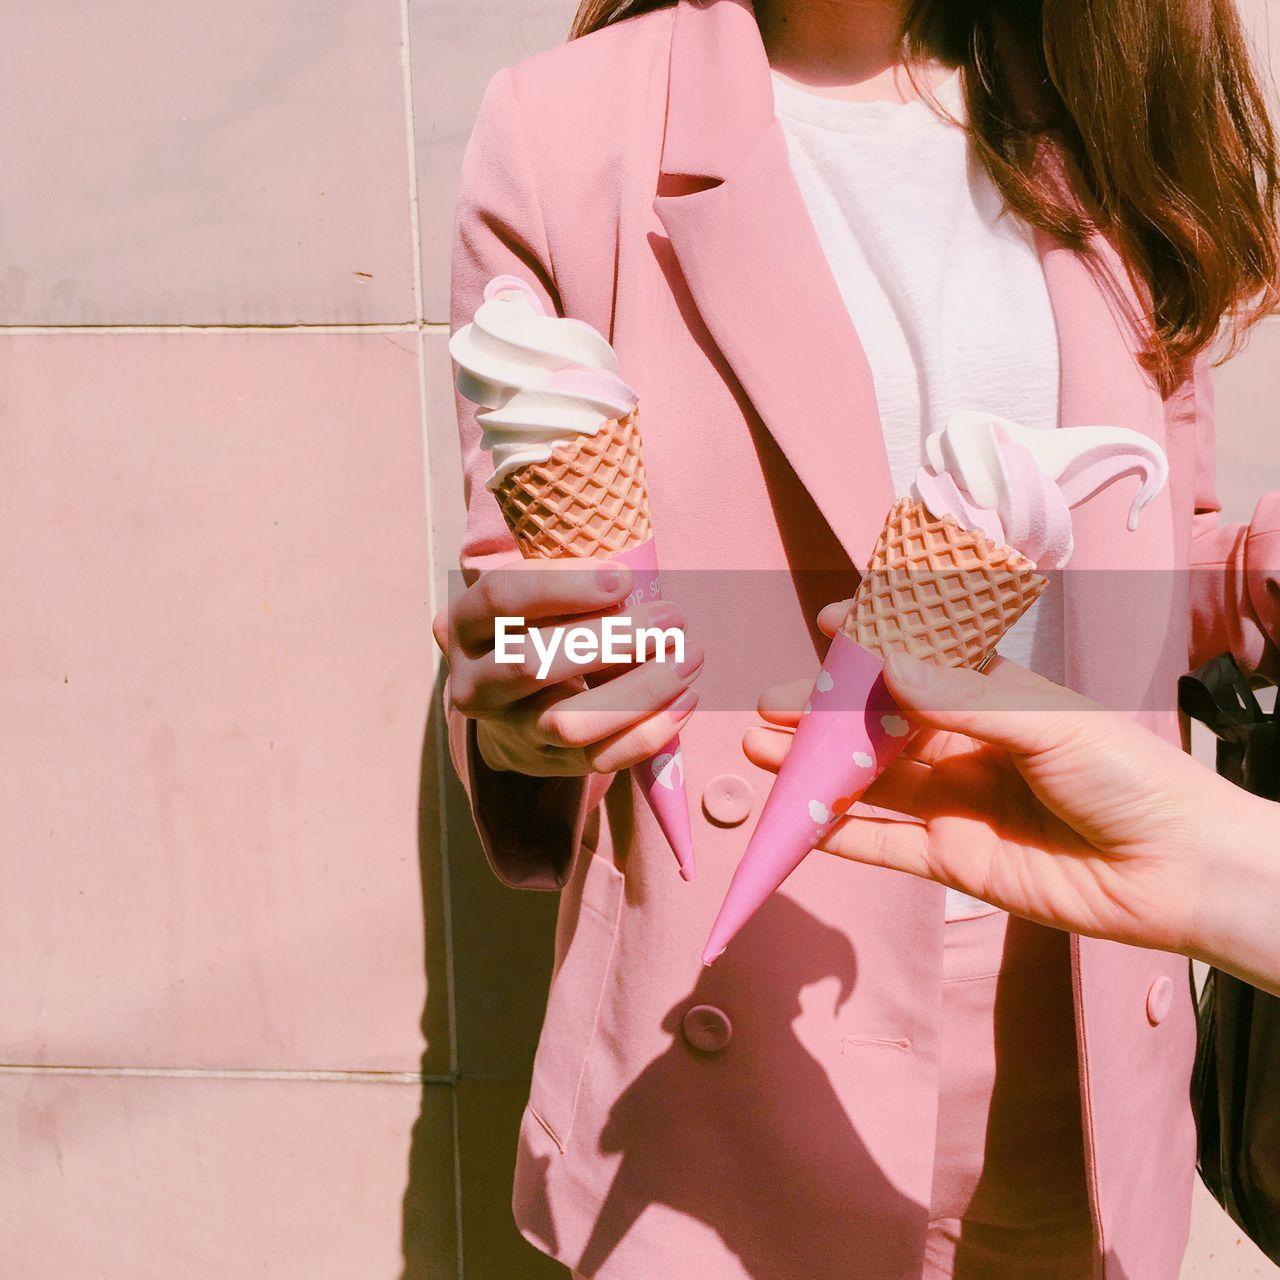 Friends Holding Ice Cream Cone